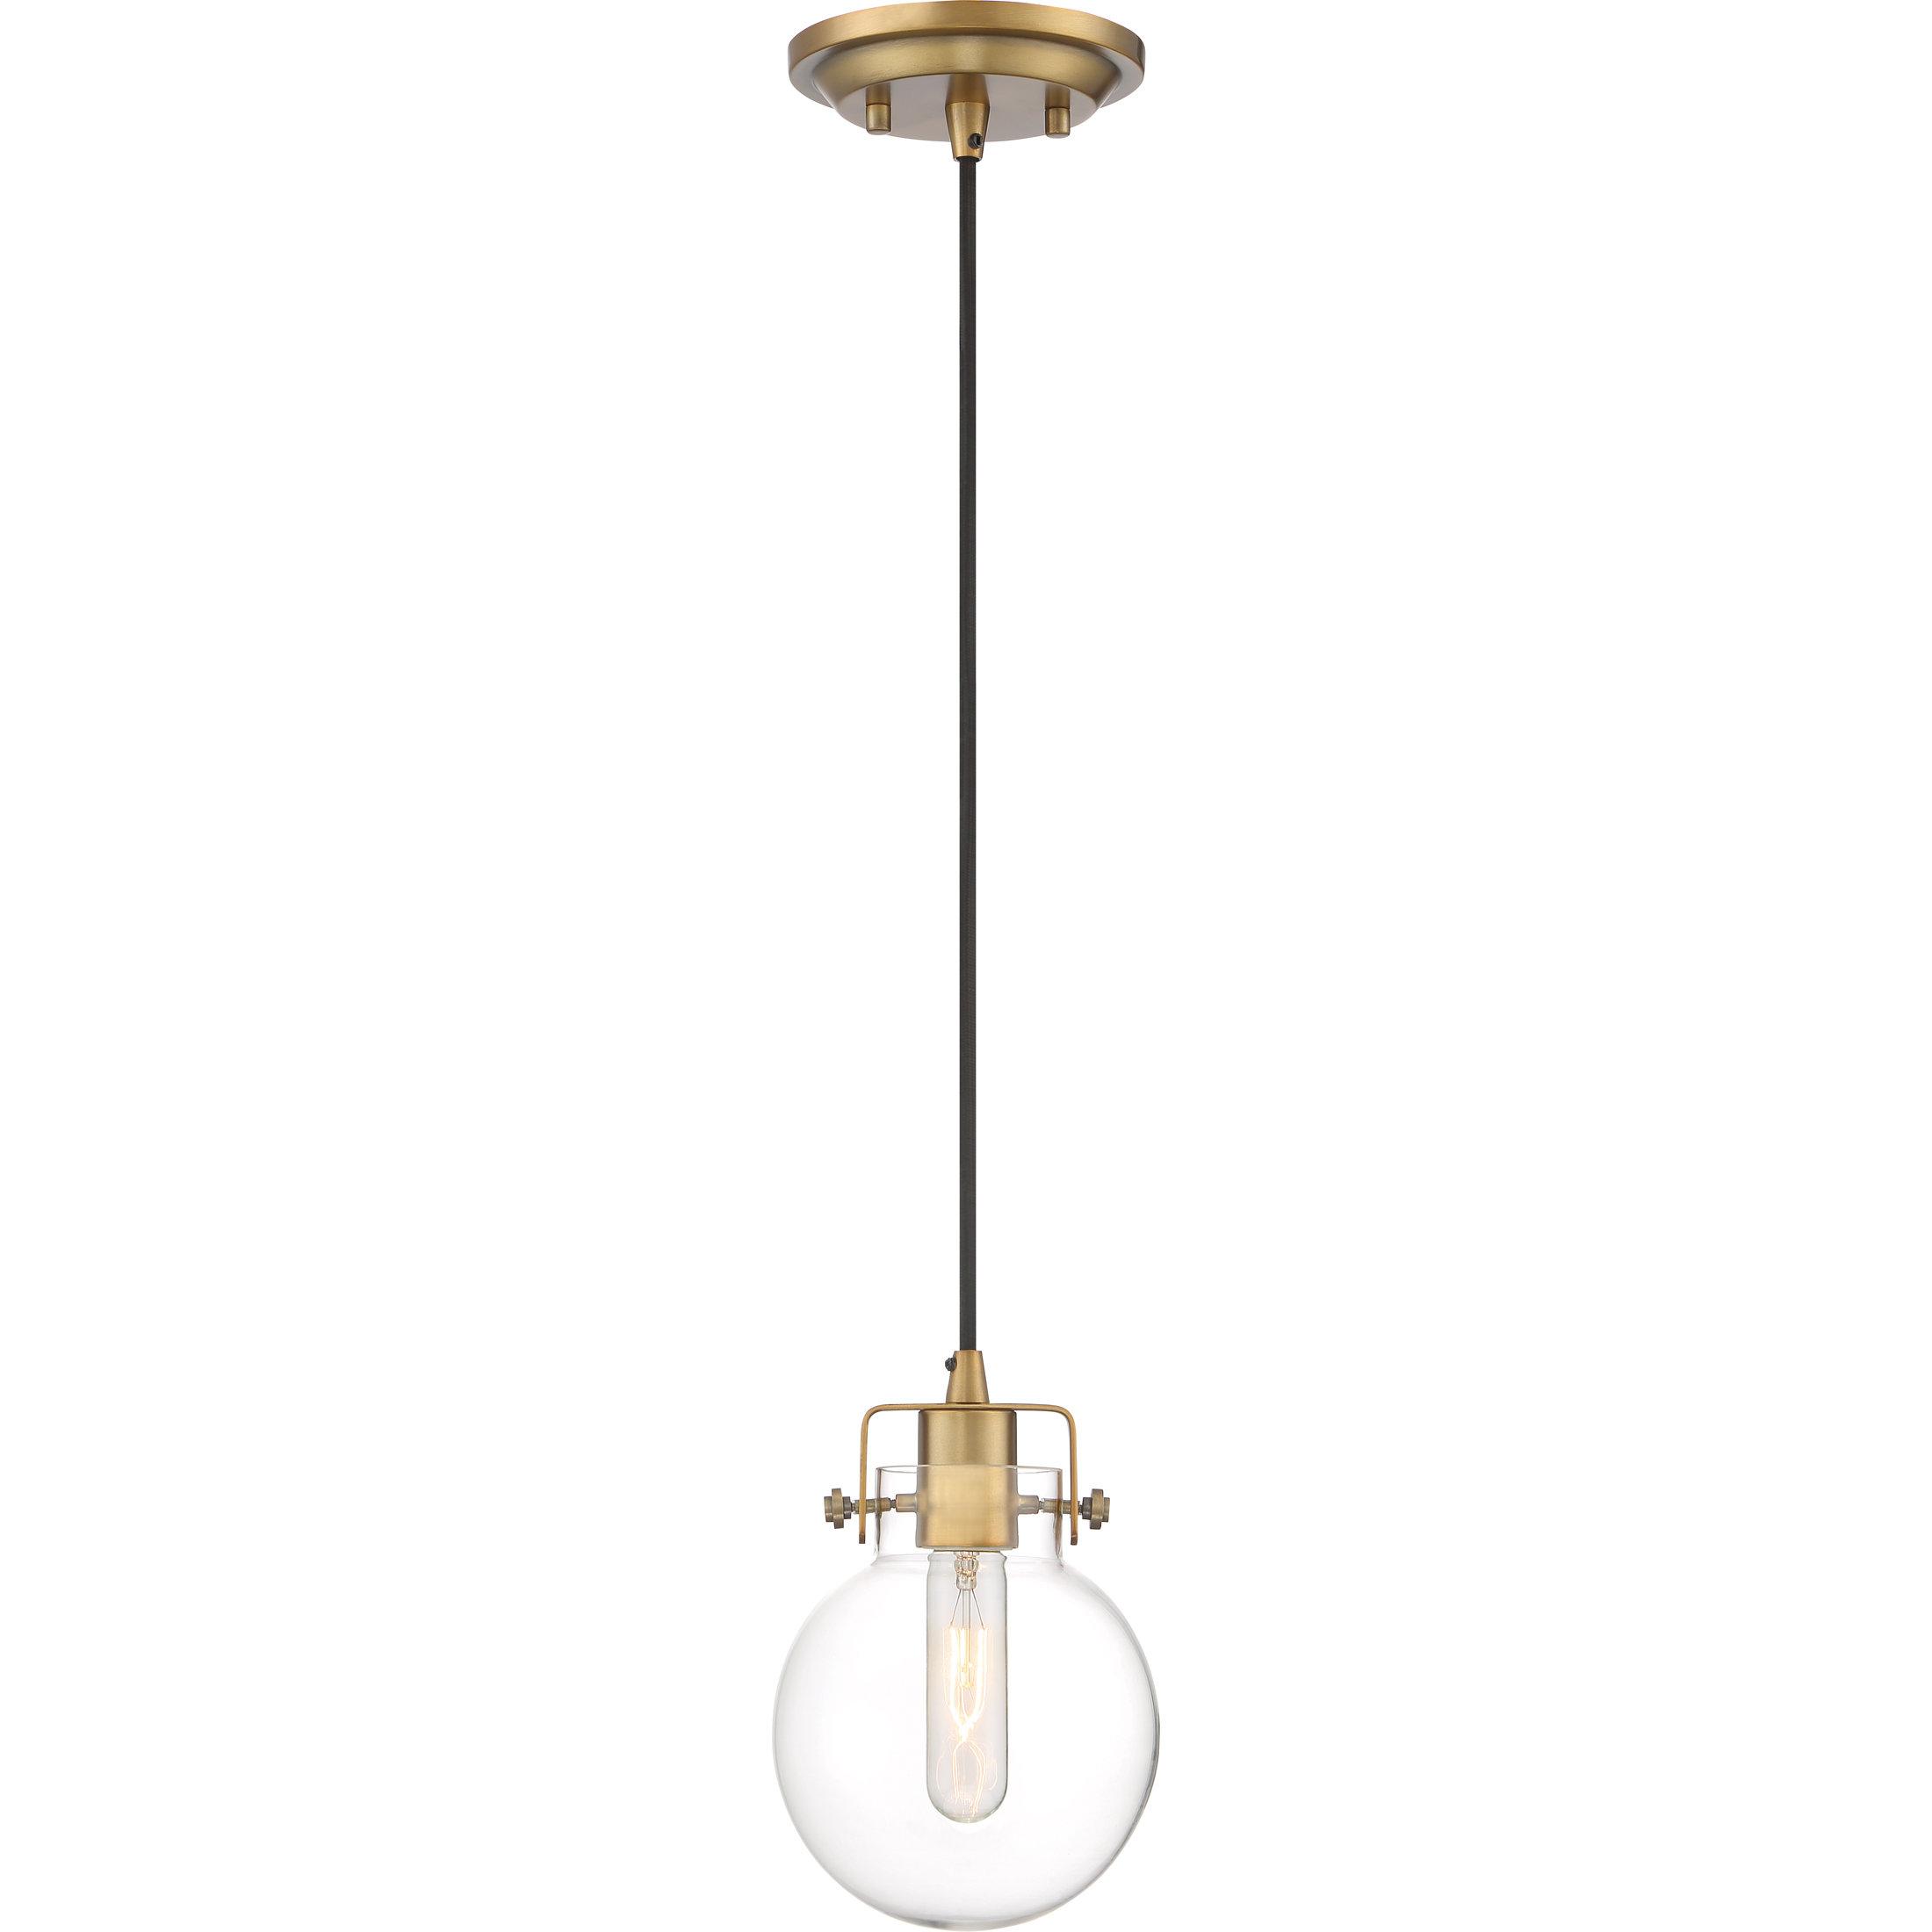 Cayden 1 Light Single Globe Pendants With Regard To Most Popular Lebron 1 Light Single Globe Pendant (View 13 of 25)